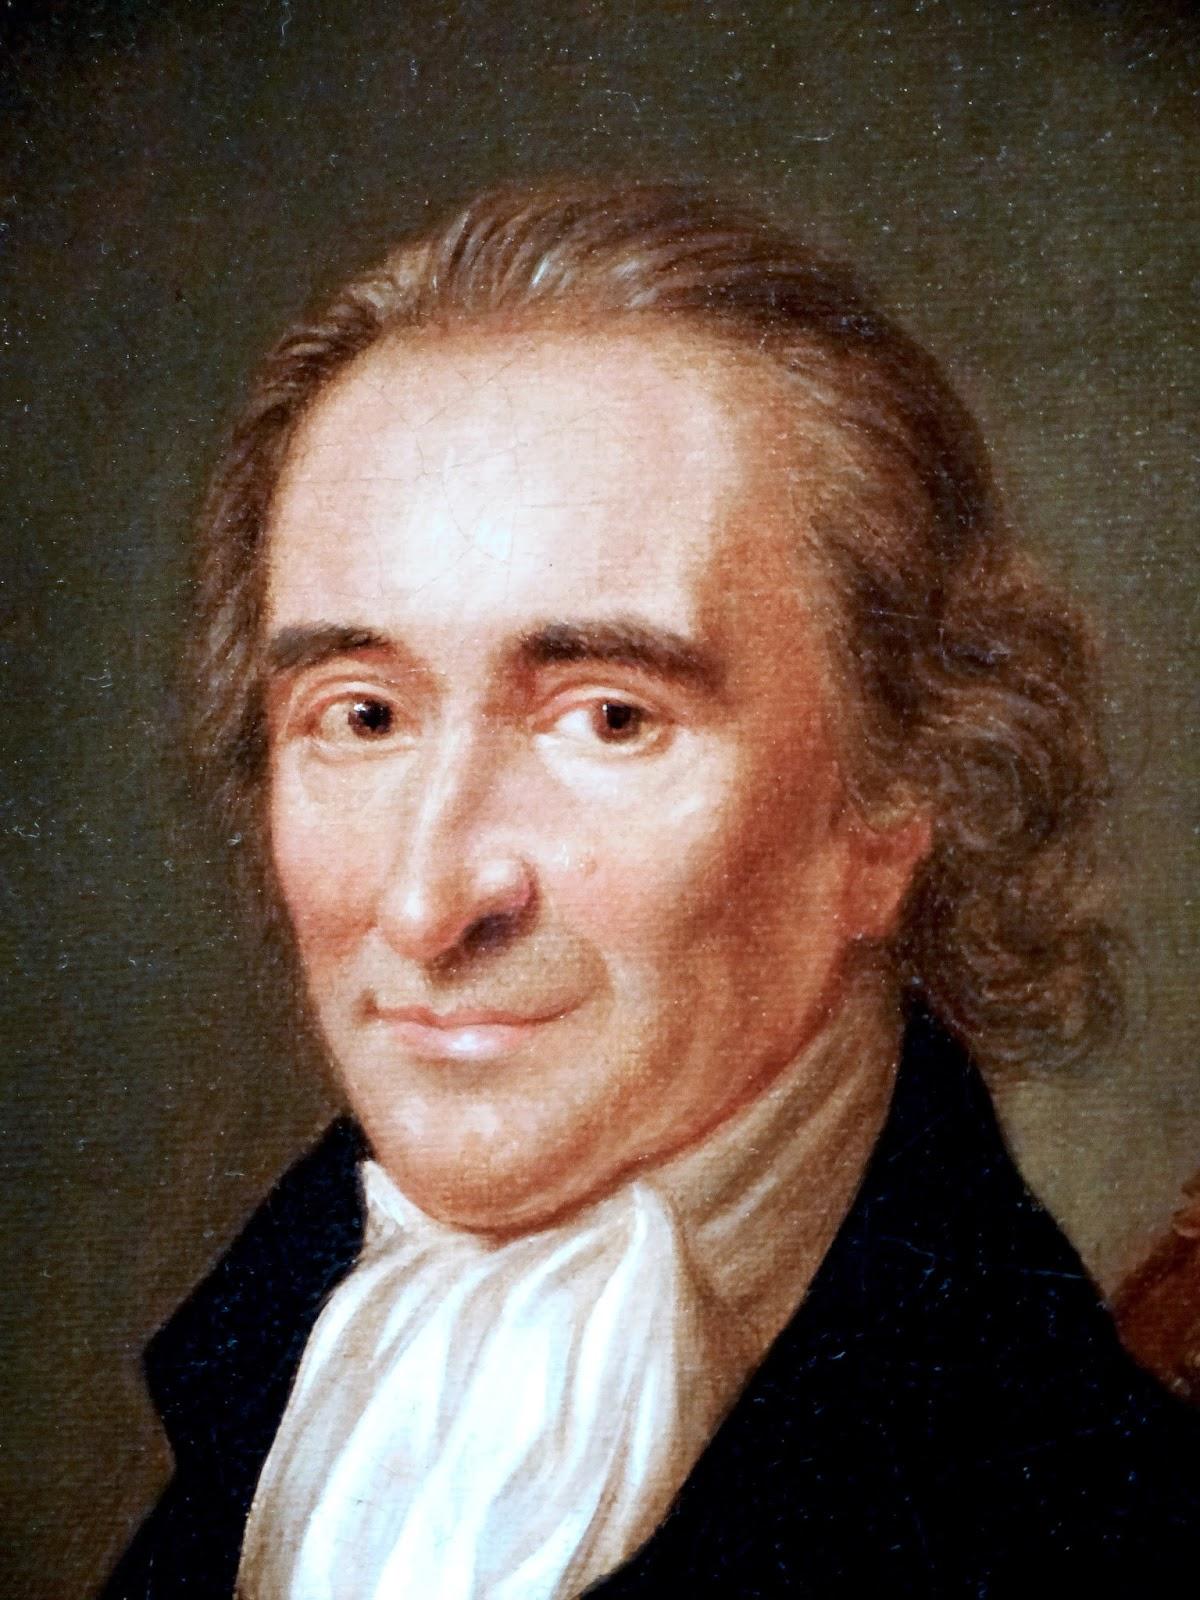 The Portrait Gallery Thomas Paine